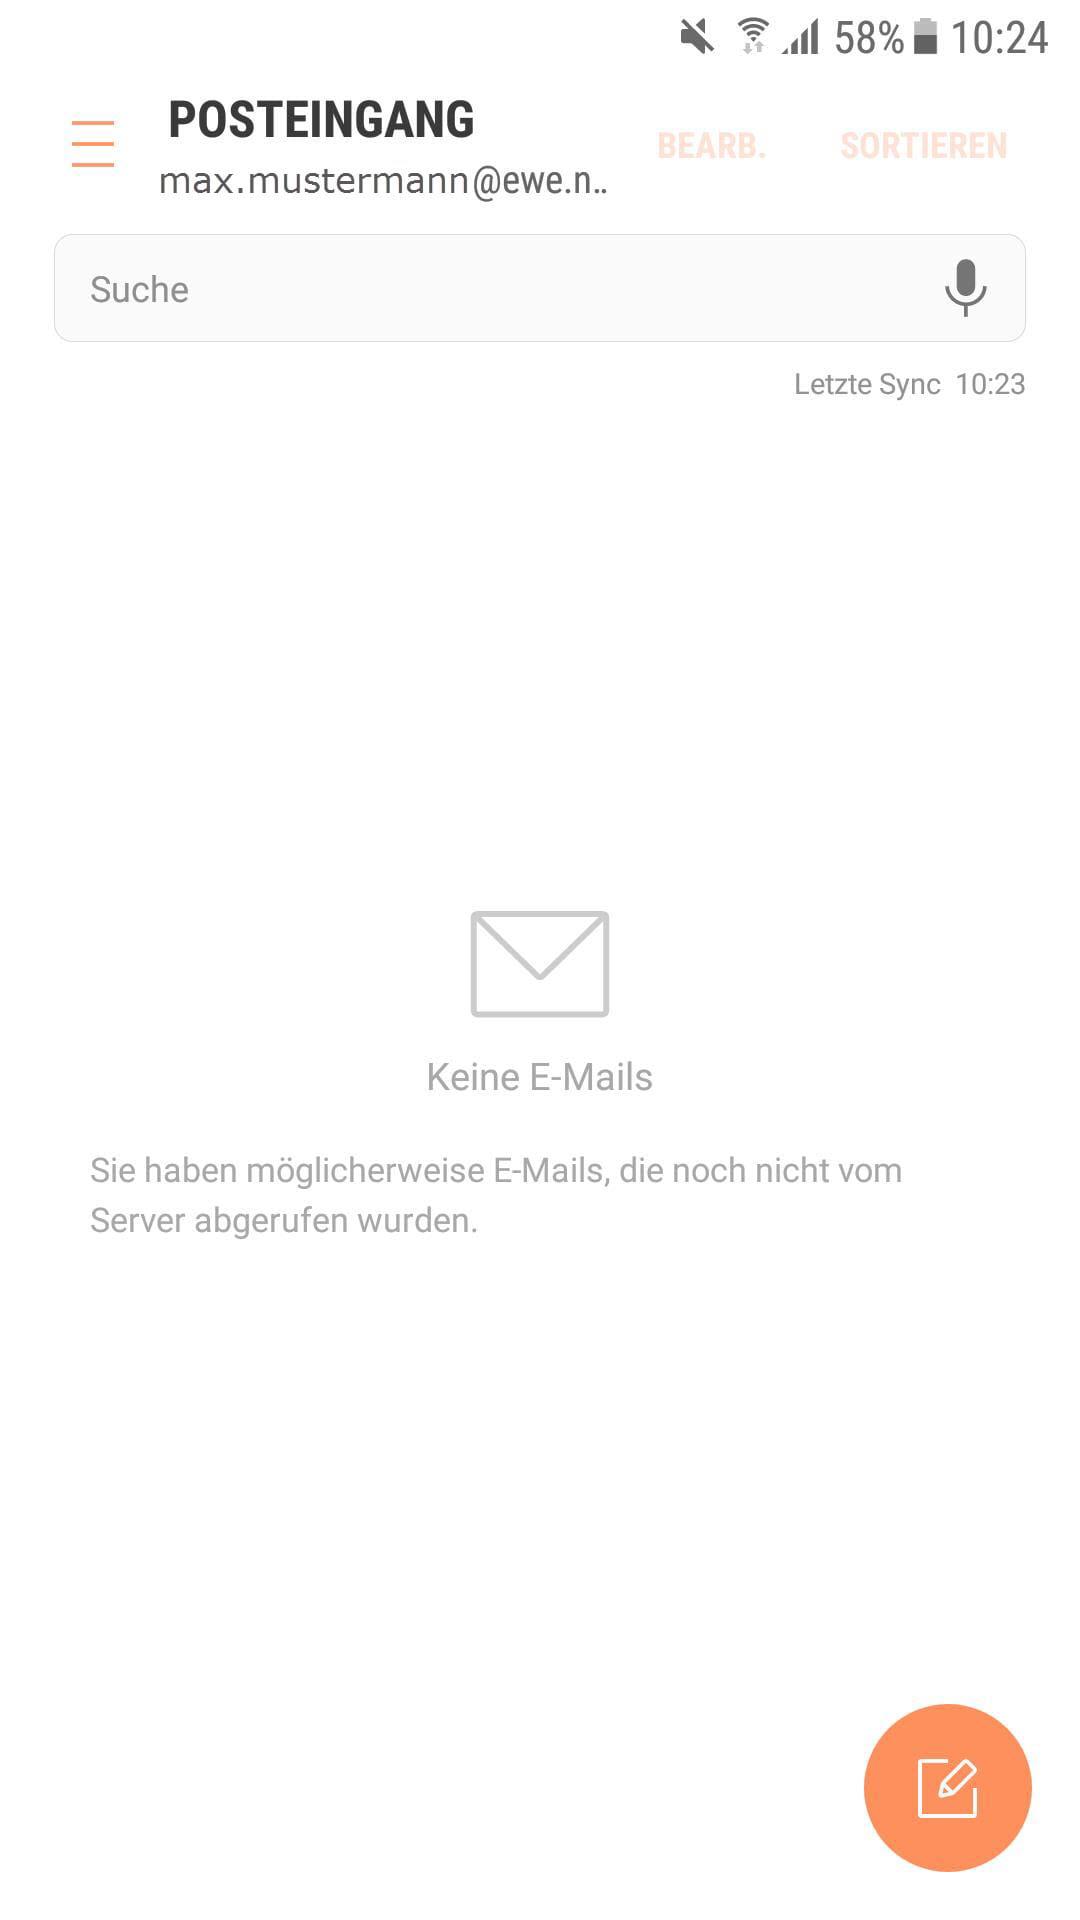 Posteingang des neu eingerichteten E-Mail Kontos